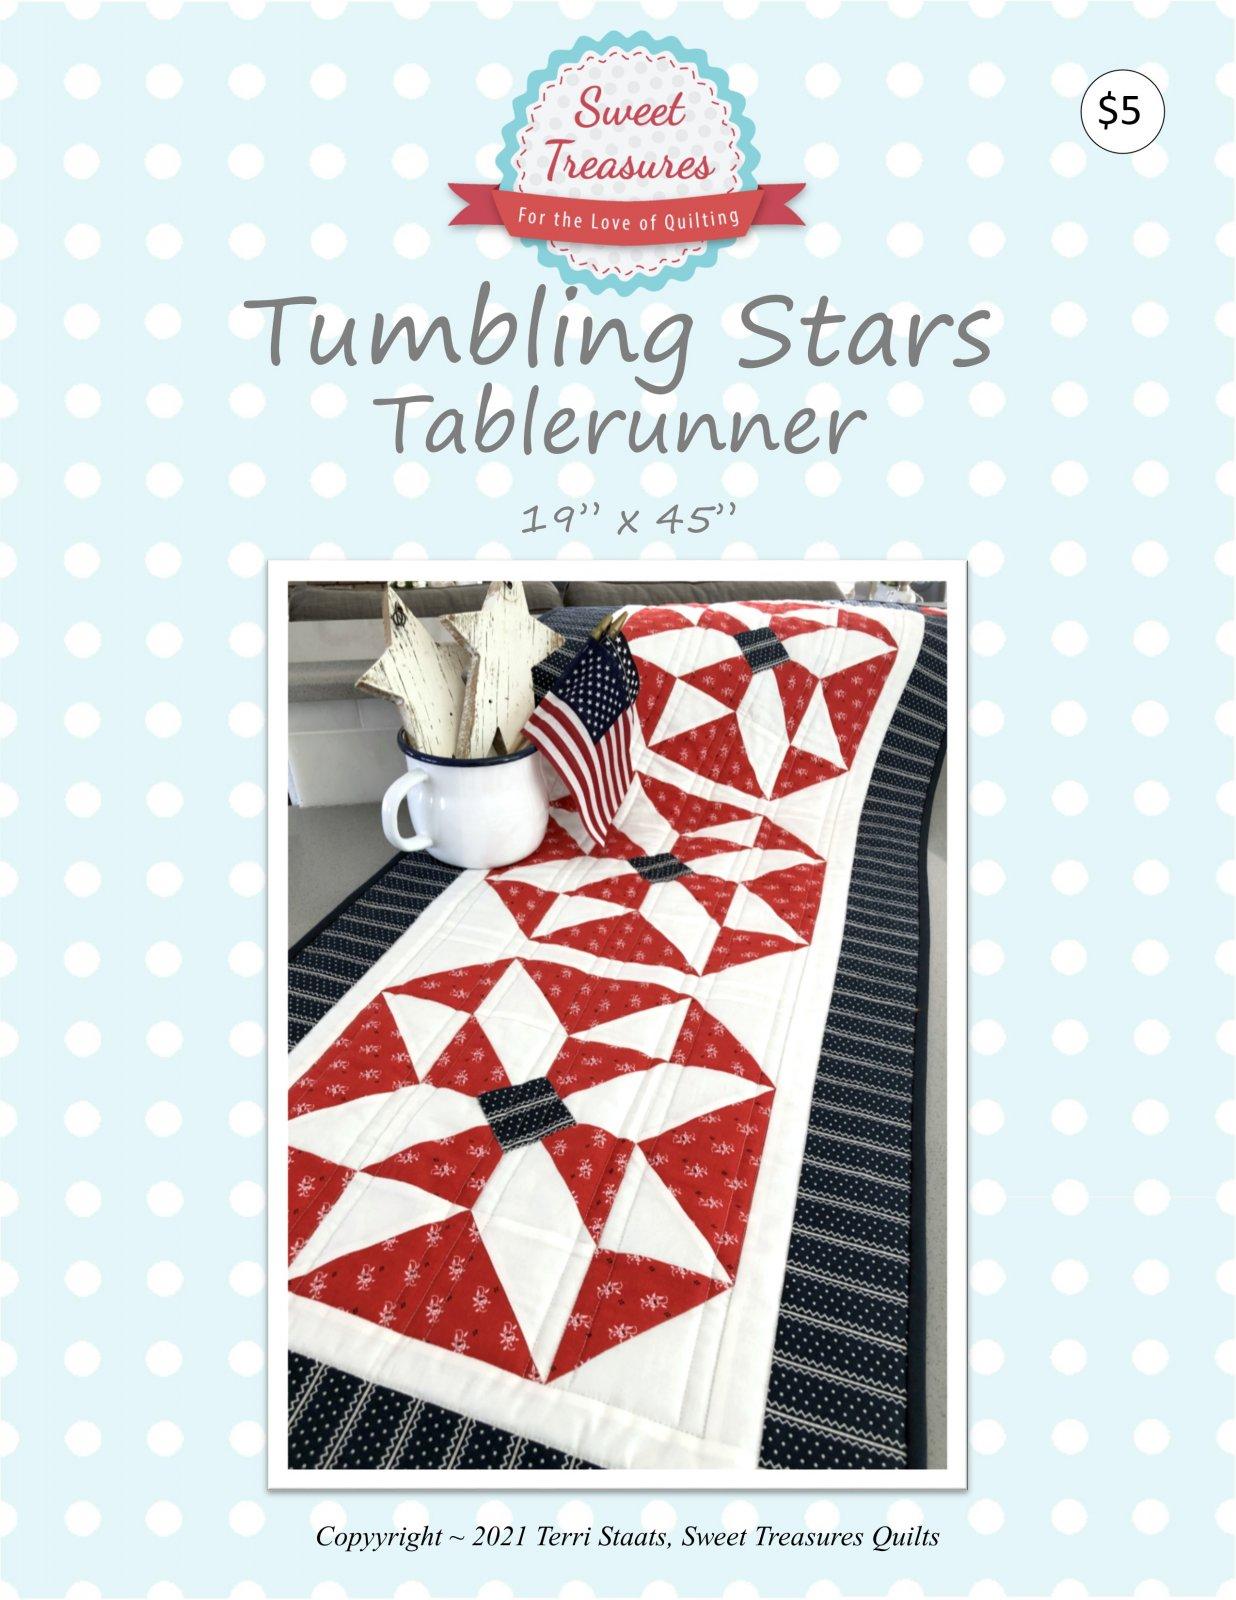 Tumbling Stars Tablerunner PDF pattern